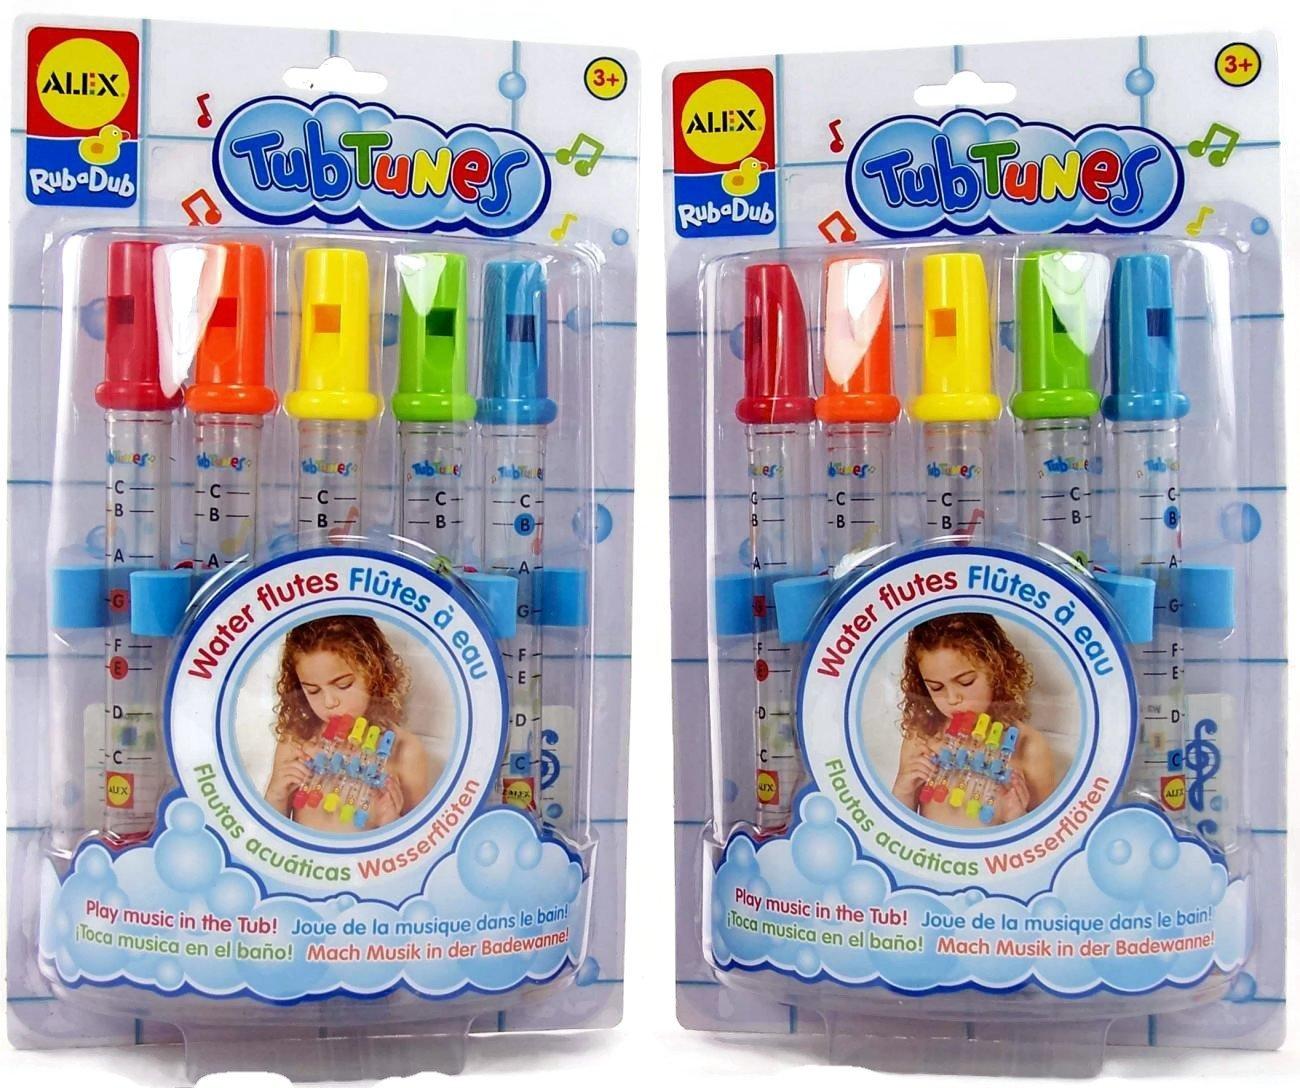 ALEX Toys Cuckoo Ltd TubTunes Bathtime Fun Water Flutes 2 Pack